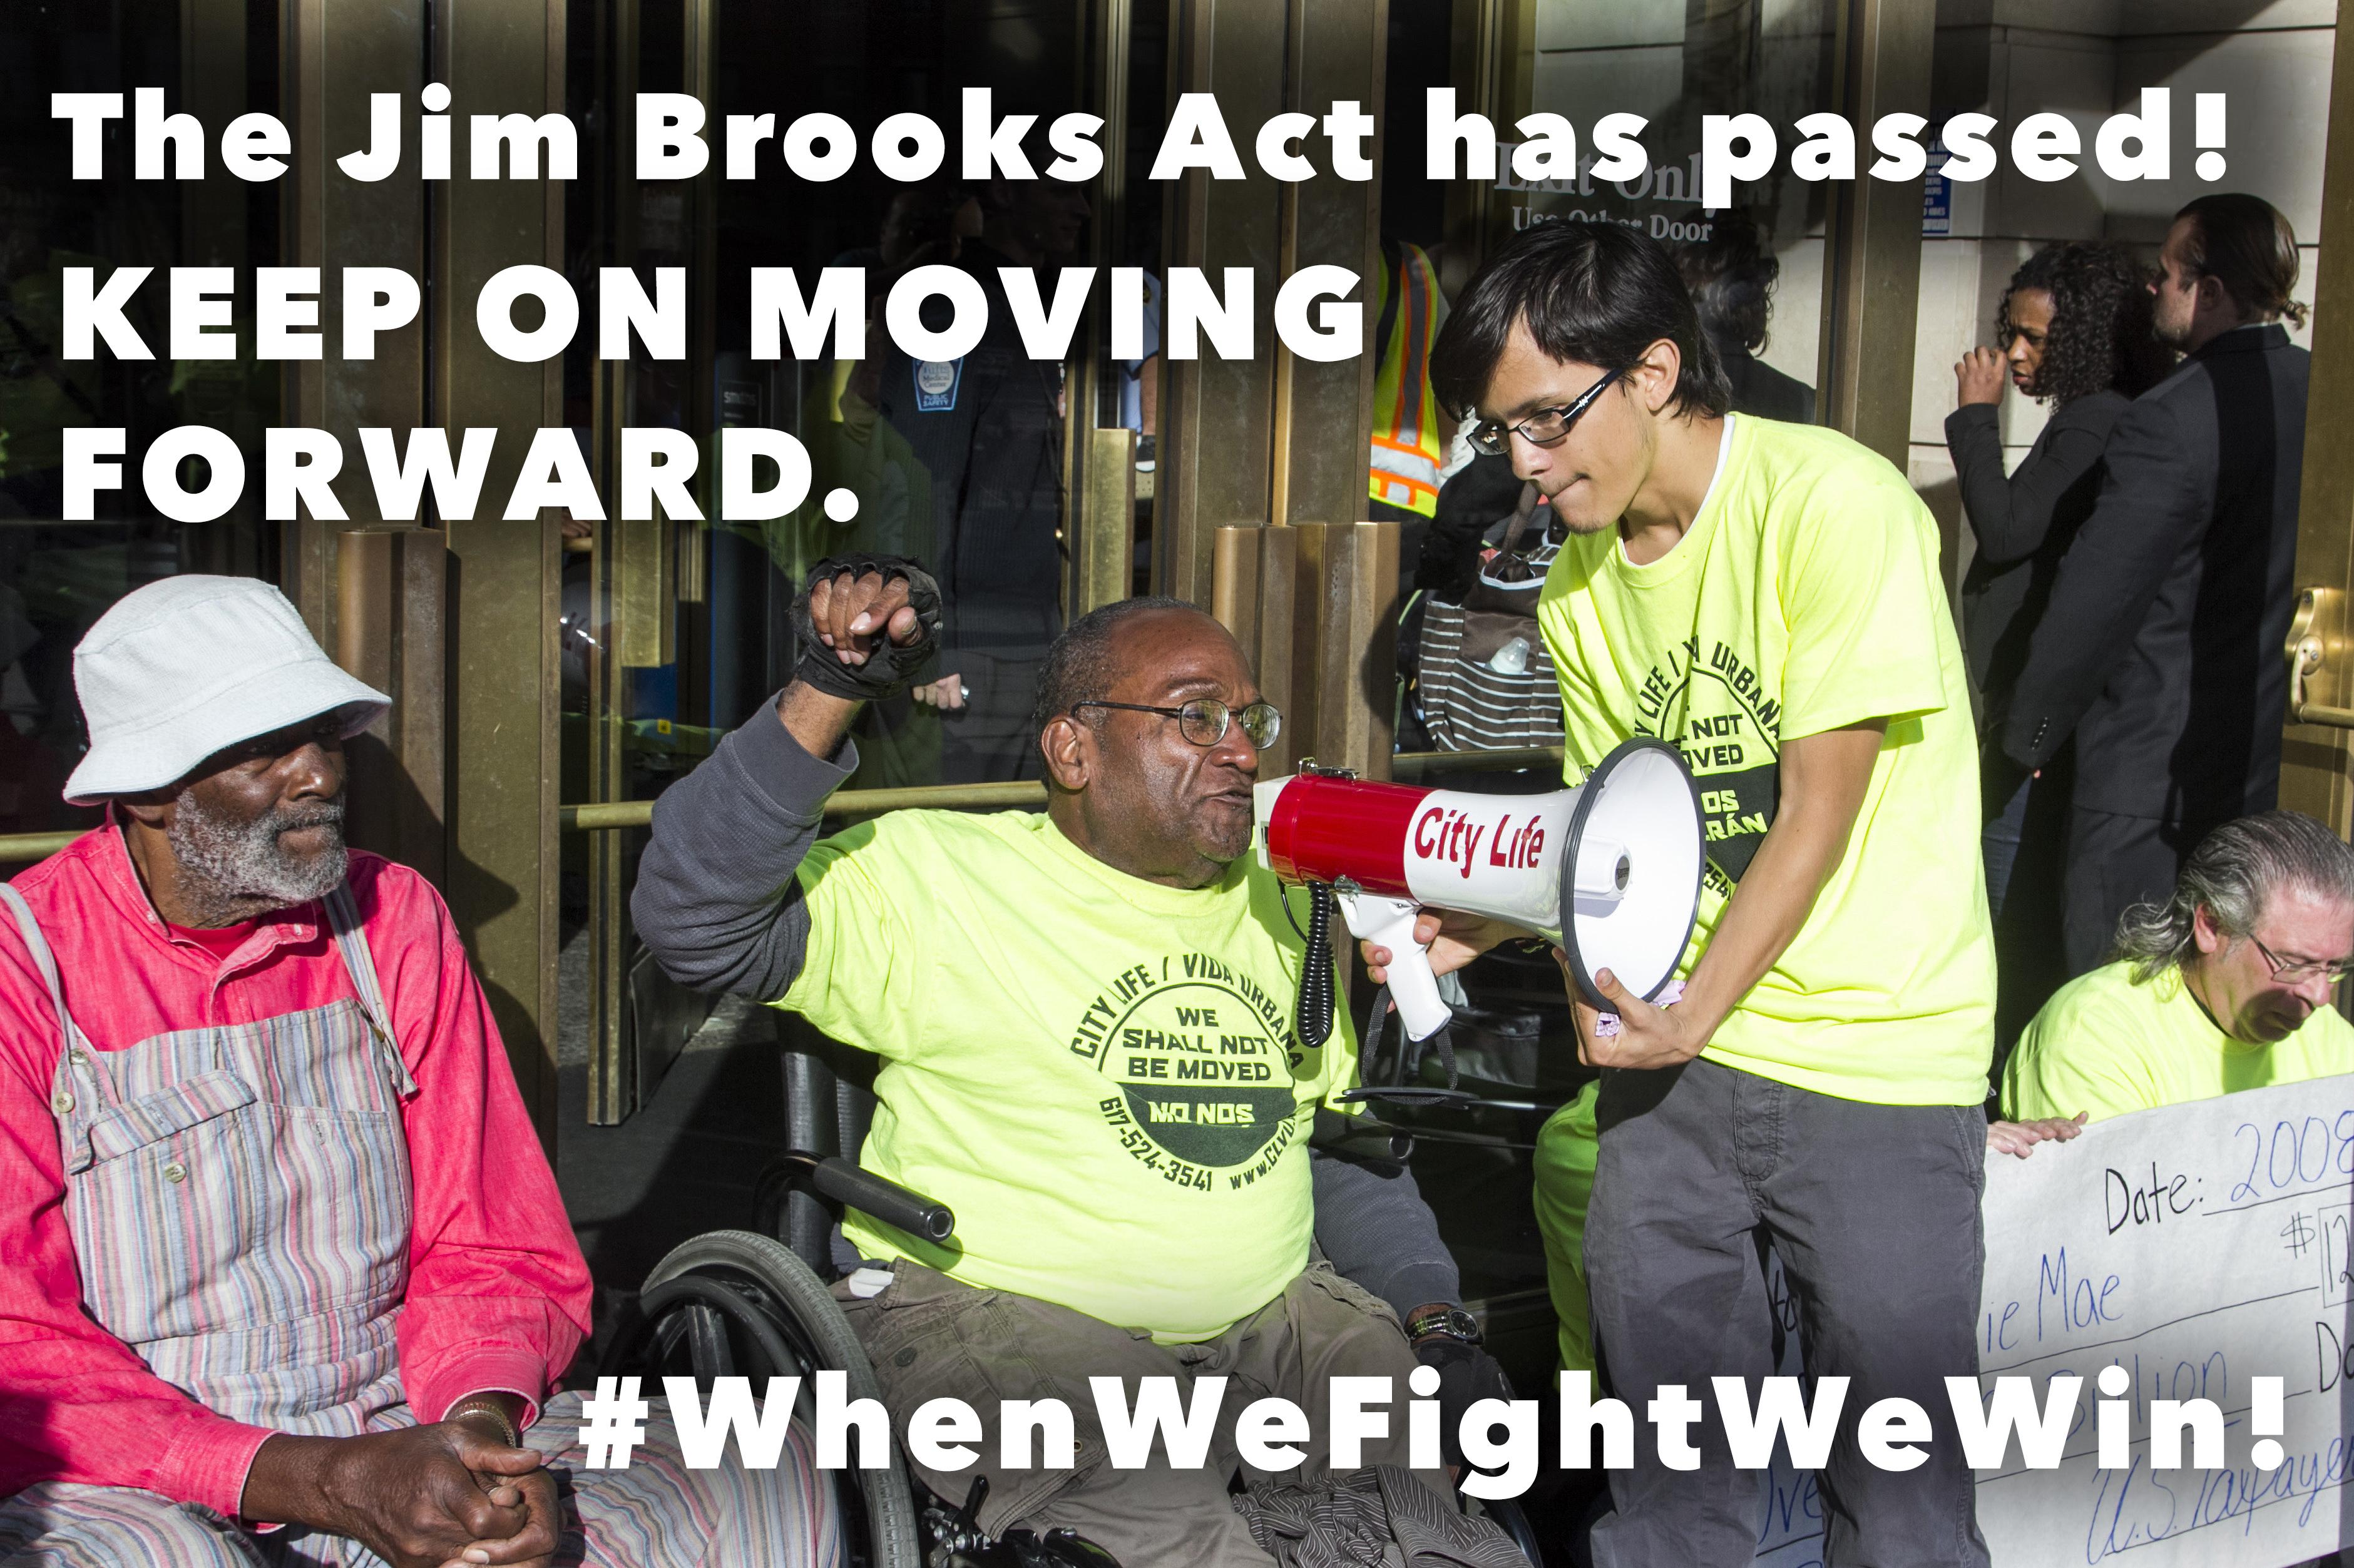 Jim Brooks Act victory!